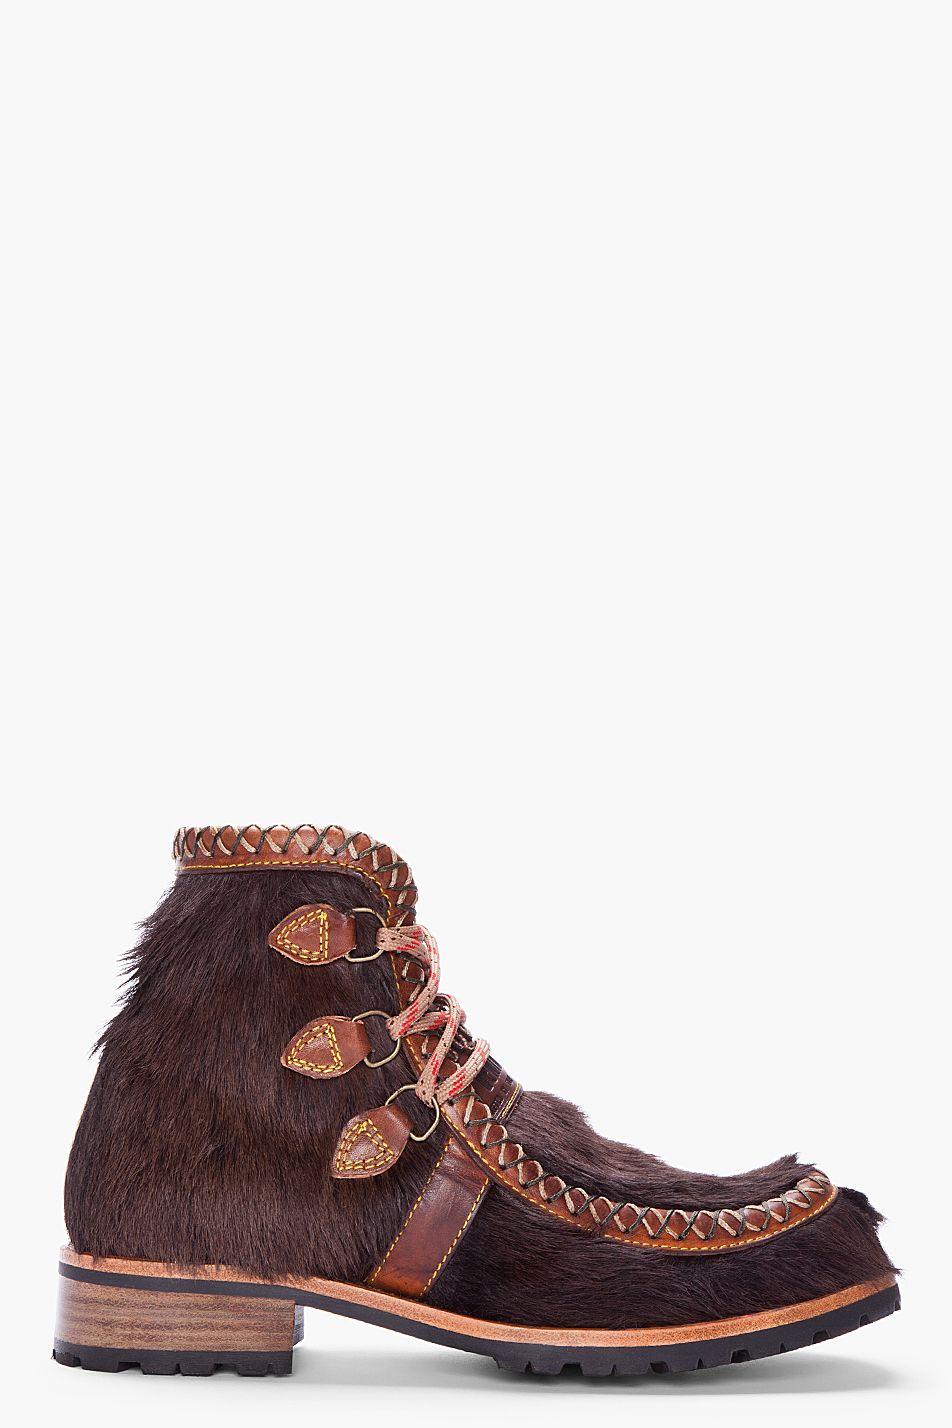 Amazing | Boots, Fantastic shoes, Boots men